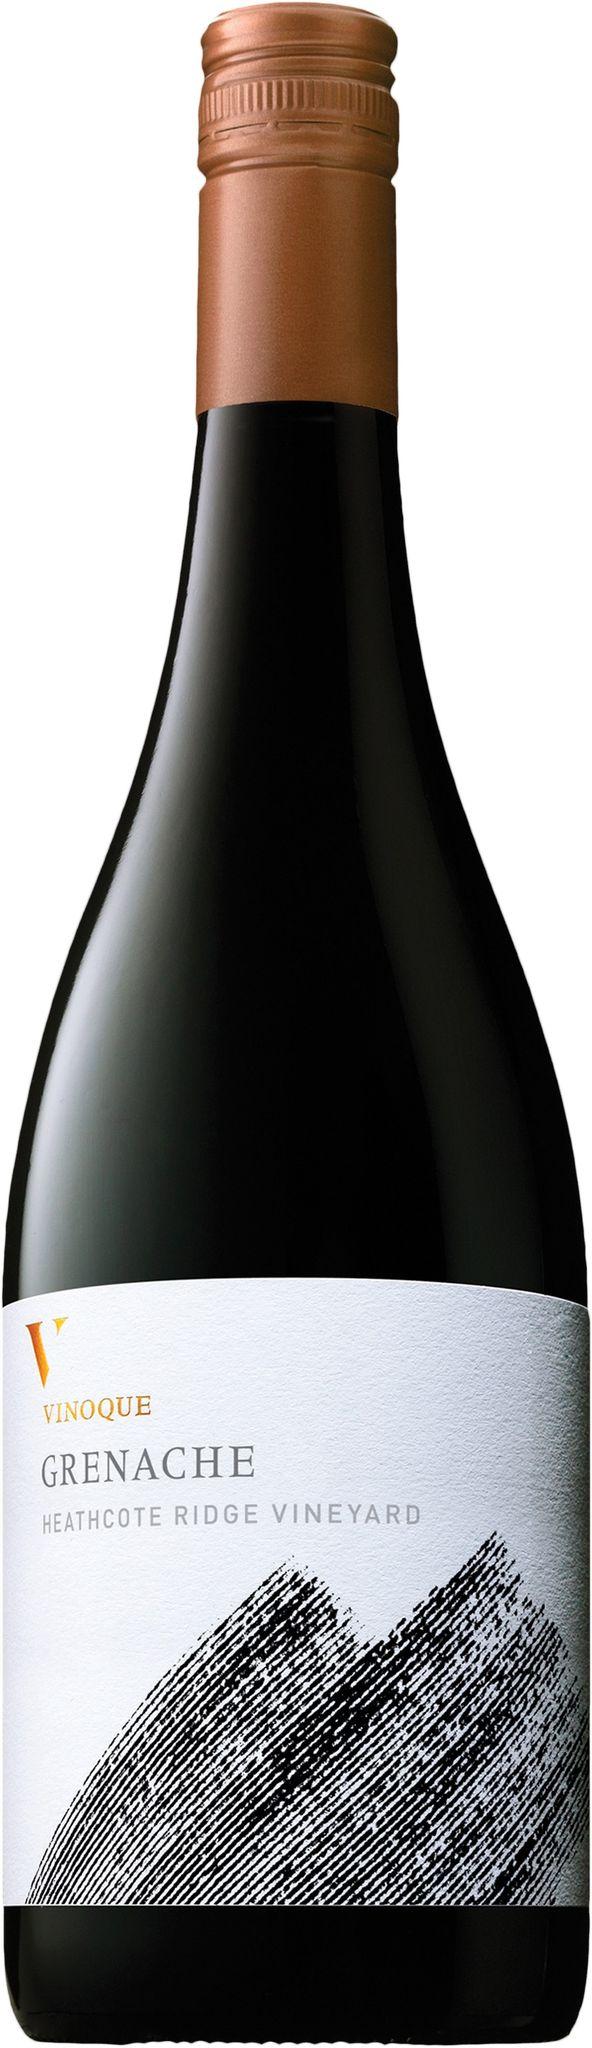 Produktbild på De Bortoli  Vinoque